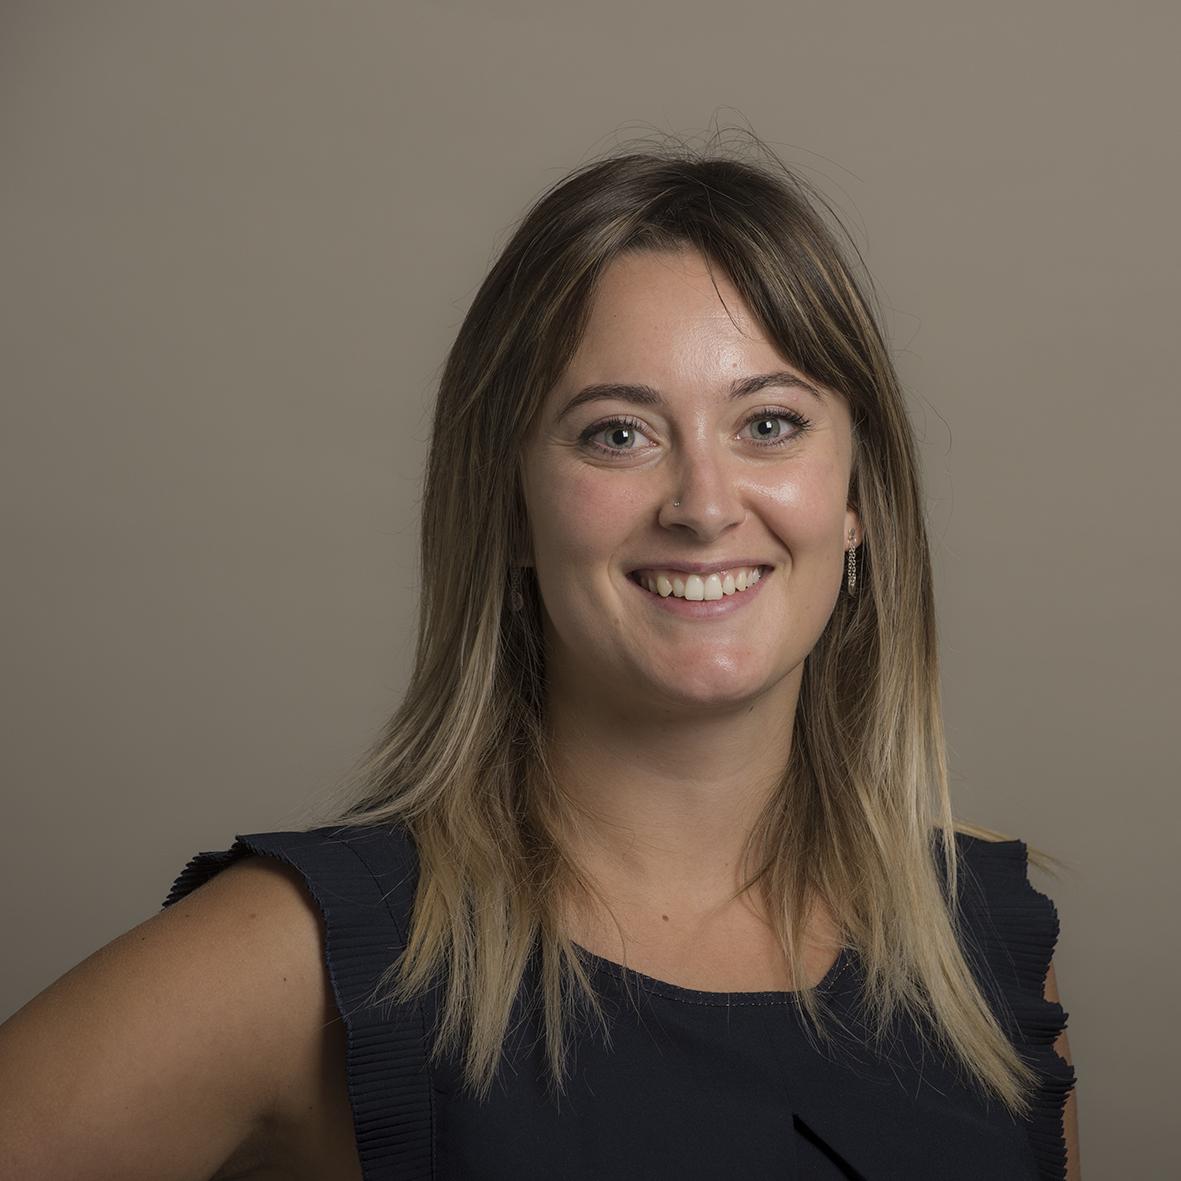 Photo de profil de   Lucie Gervaud, CEO